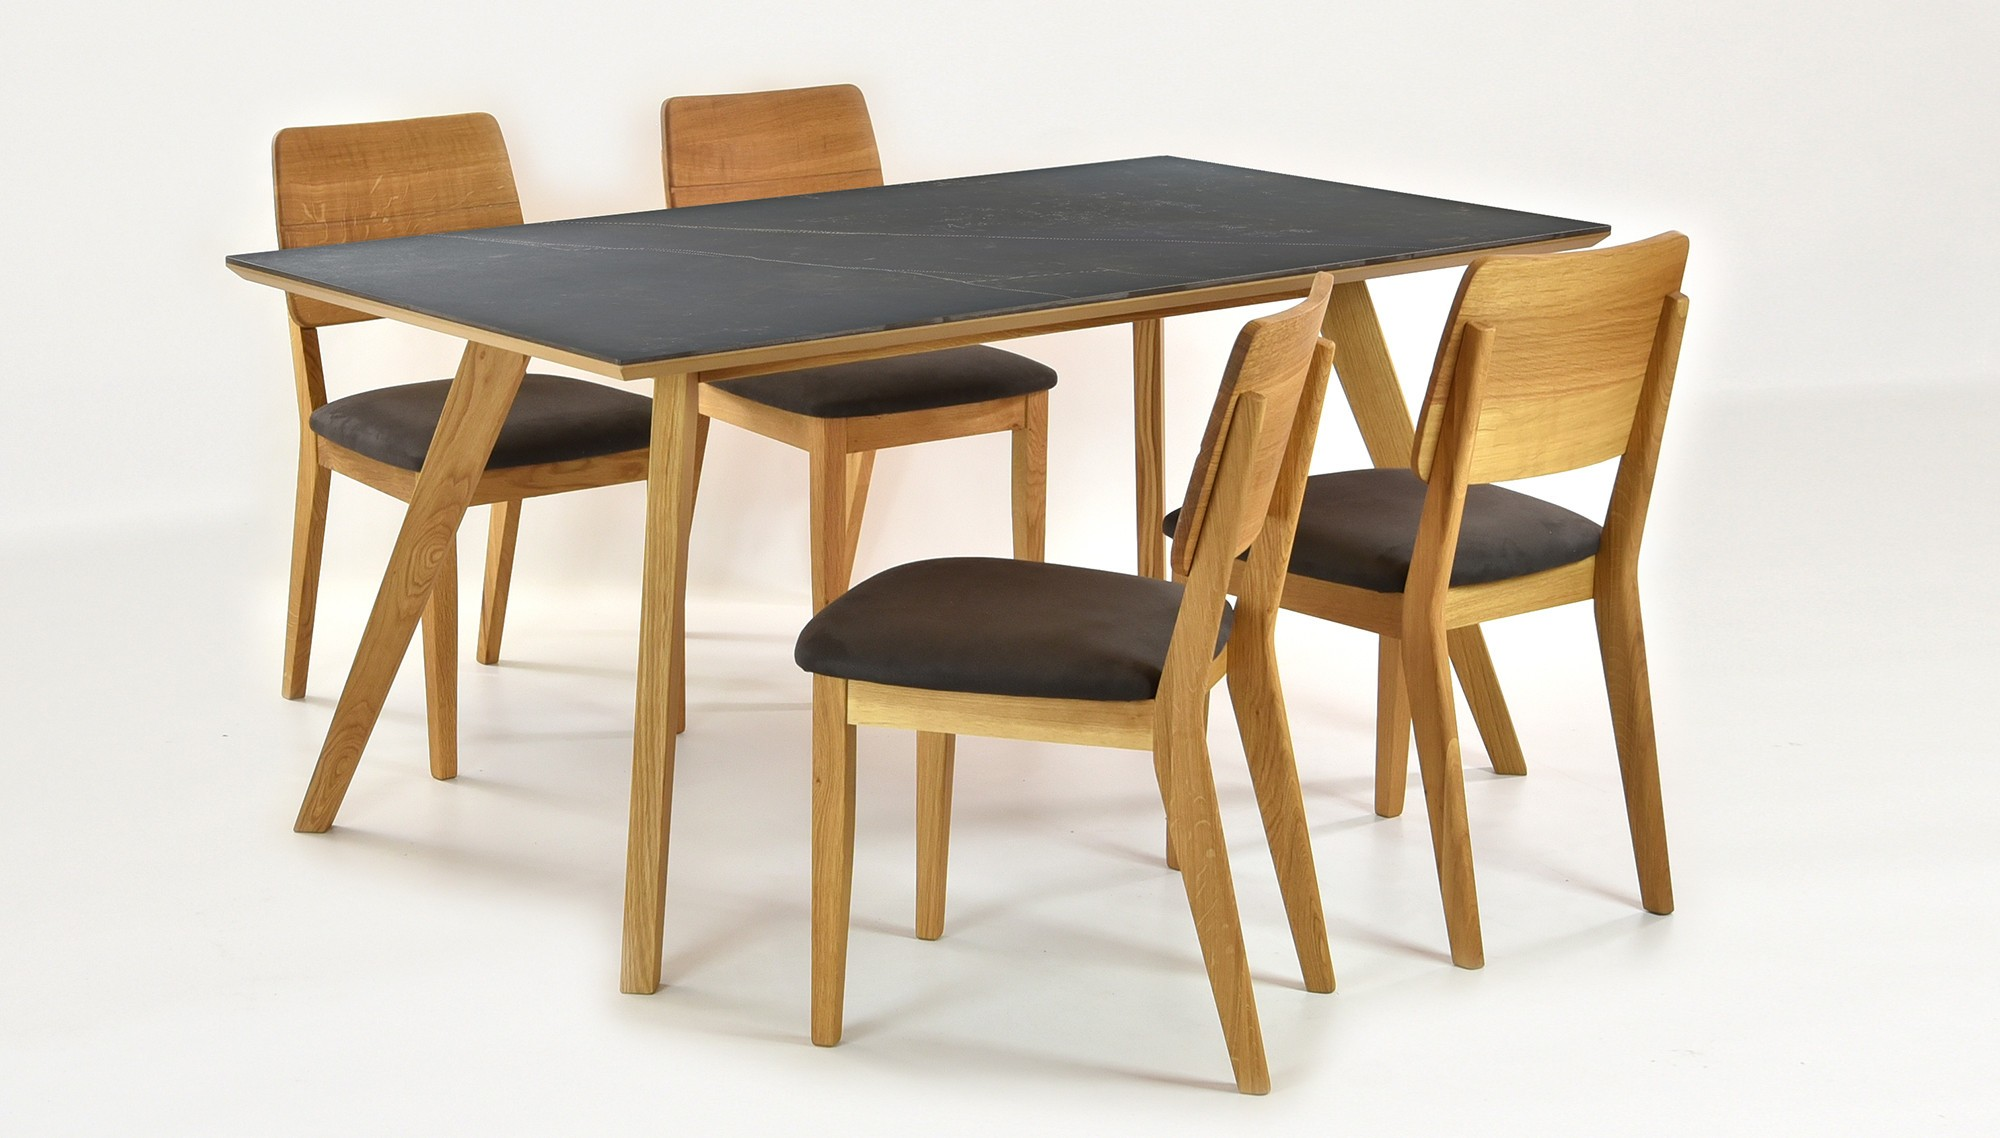 0c7afd2d2ad6 Jedálenský stôl pre 4- 6 osôb (Stôl dekton 160 x 90